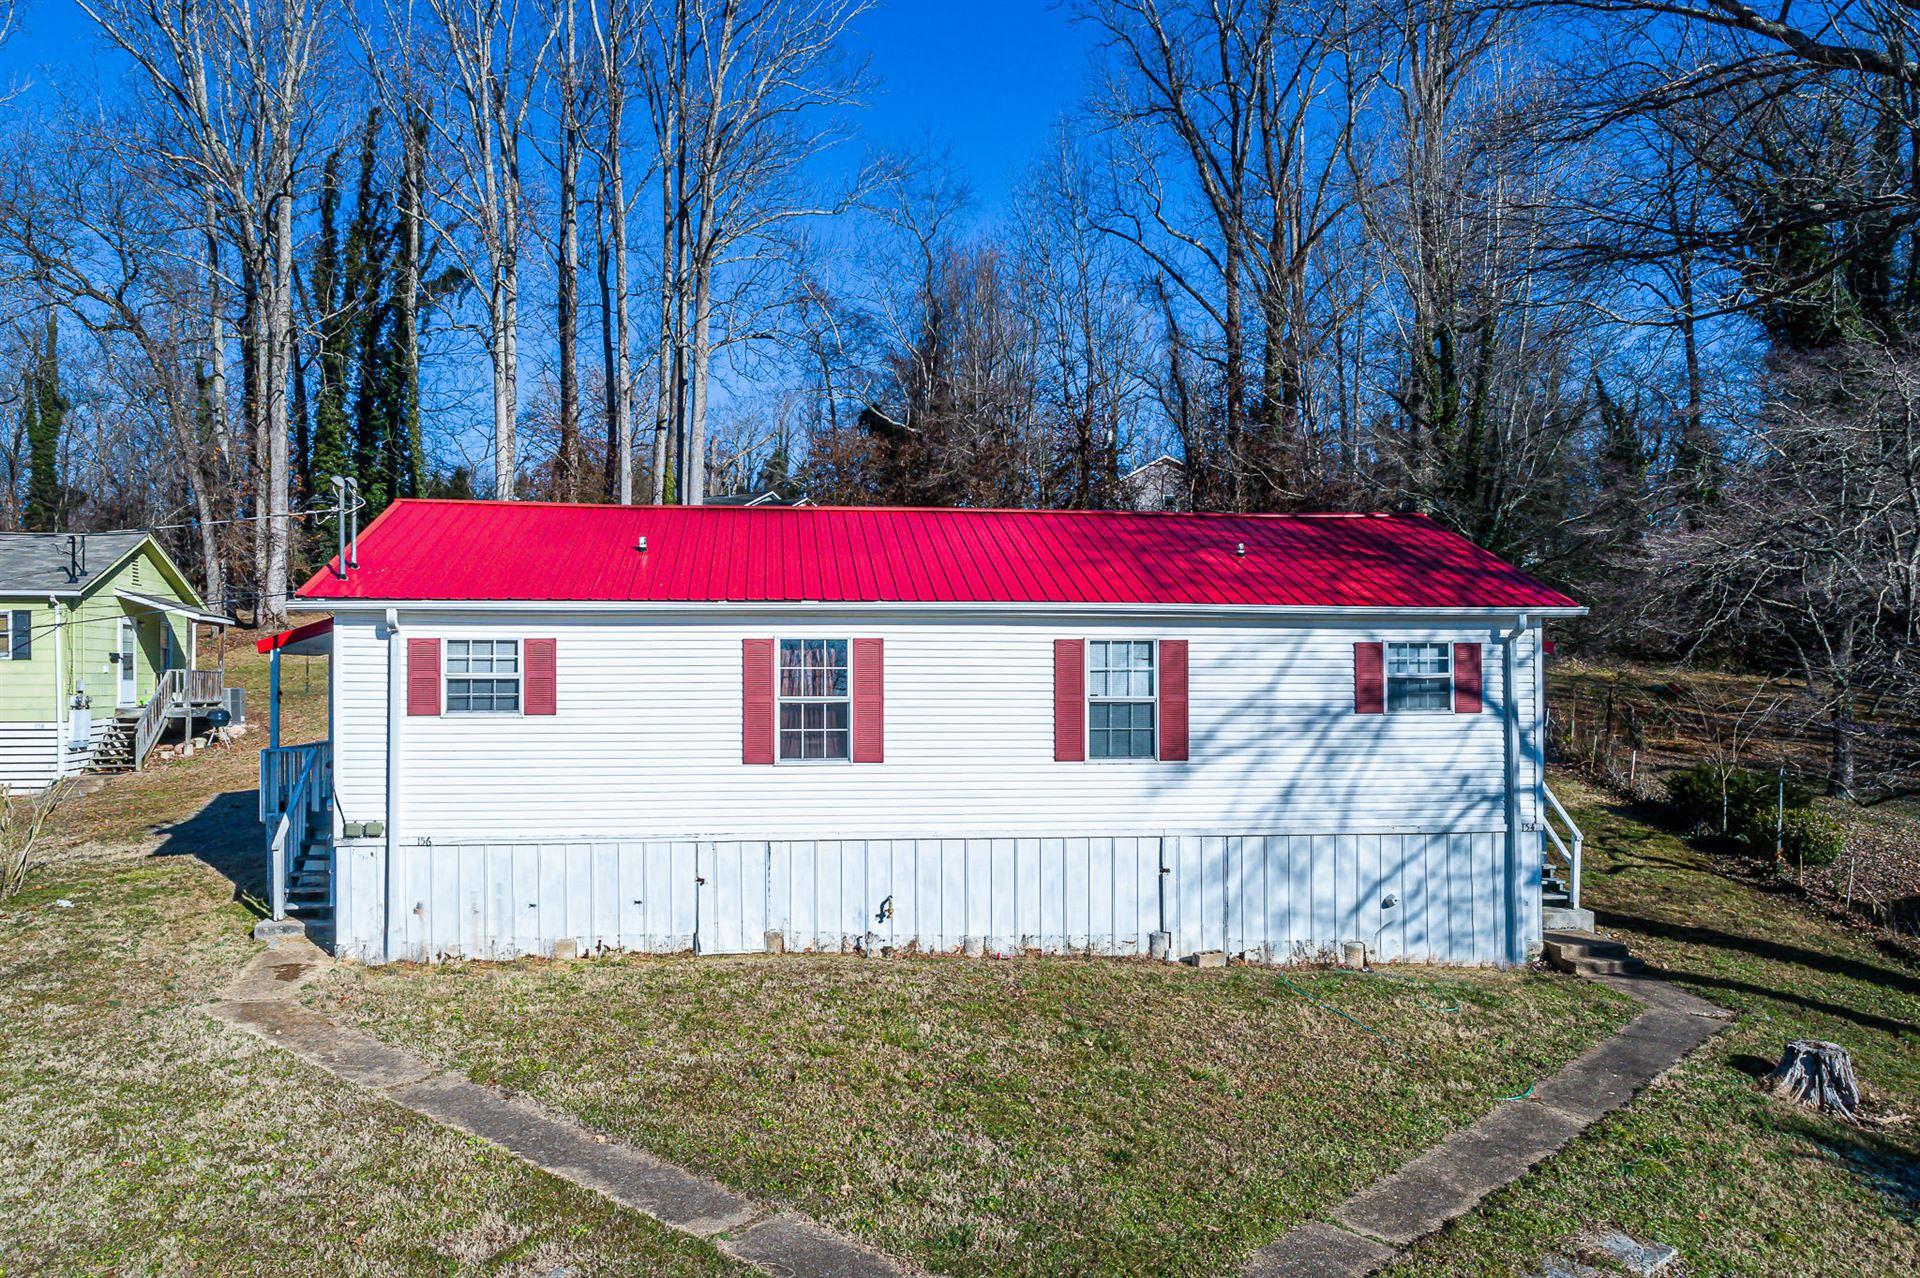 Photo of 154 W Wadsworth Circle, Oak Ridge, TN 37830 (MLS # 1142664)